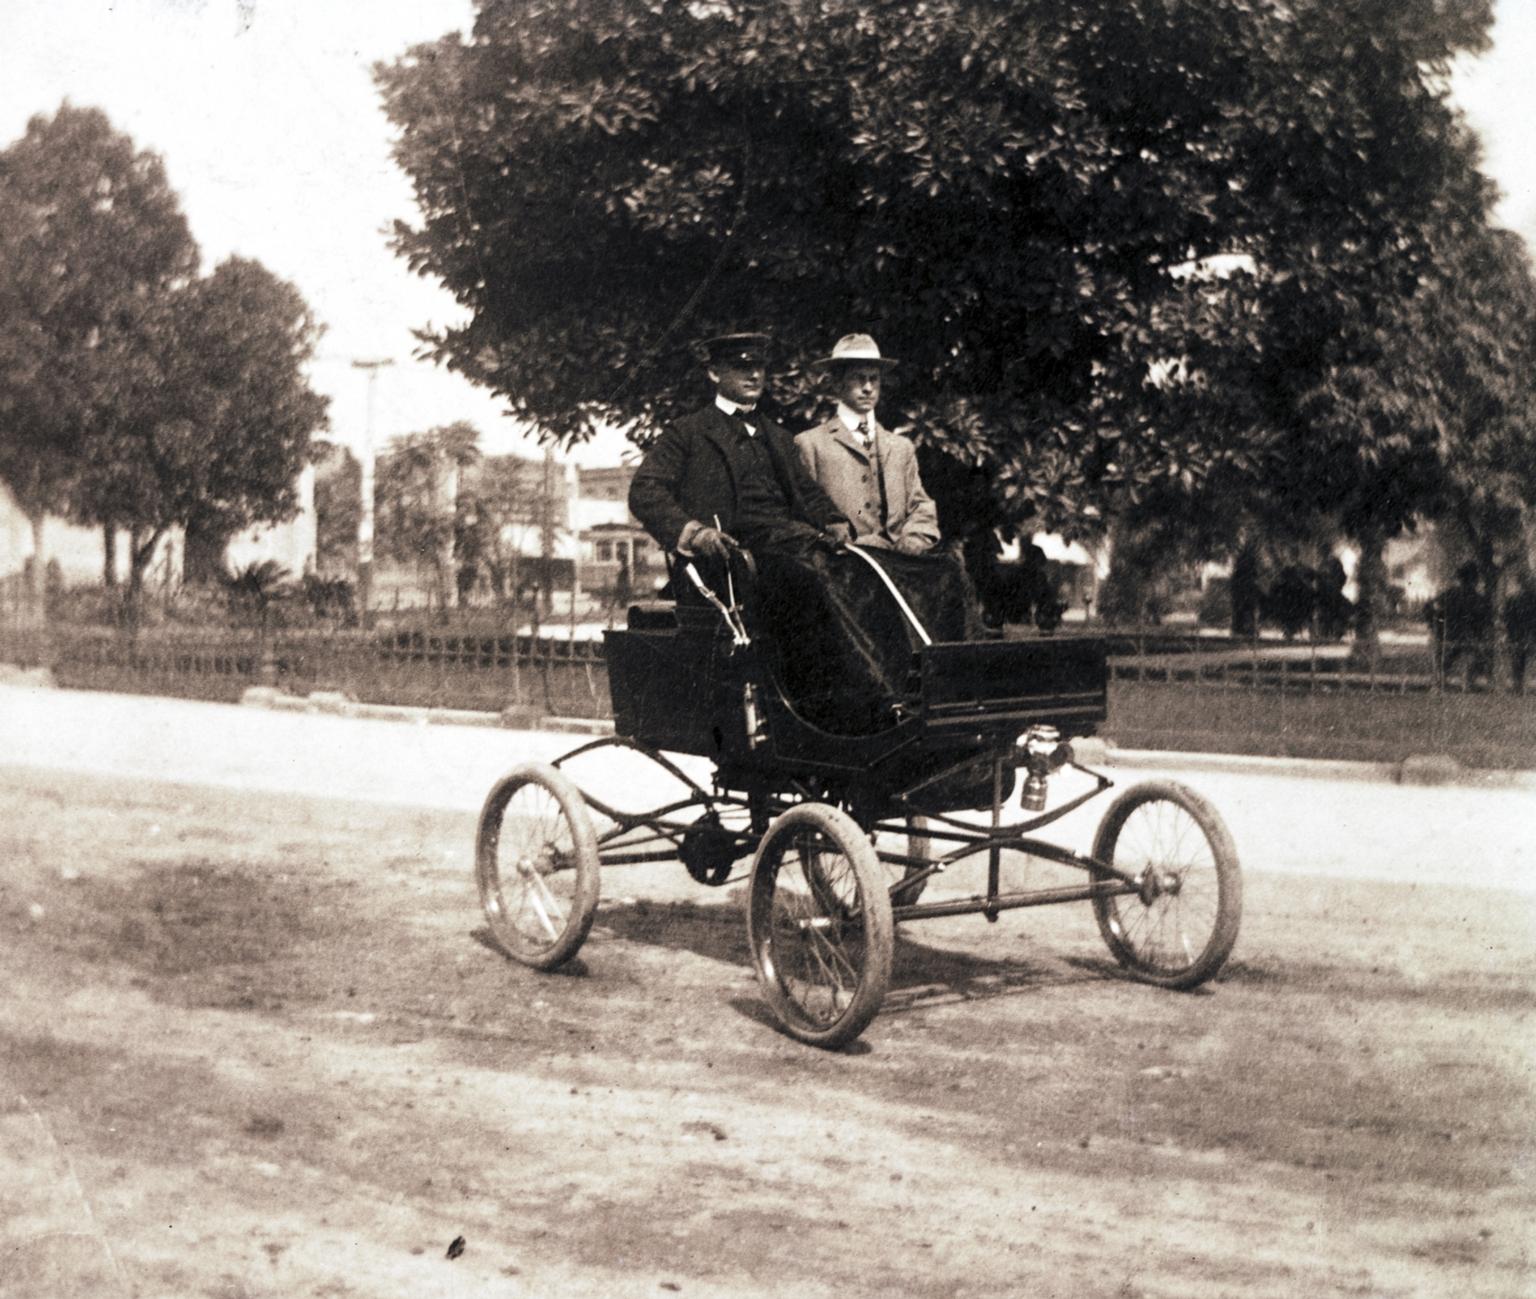 G. Allan Hancock driving his 1900 Milwaukee Steam Runabout